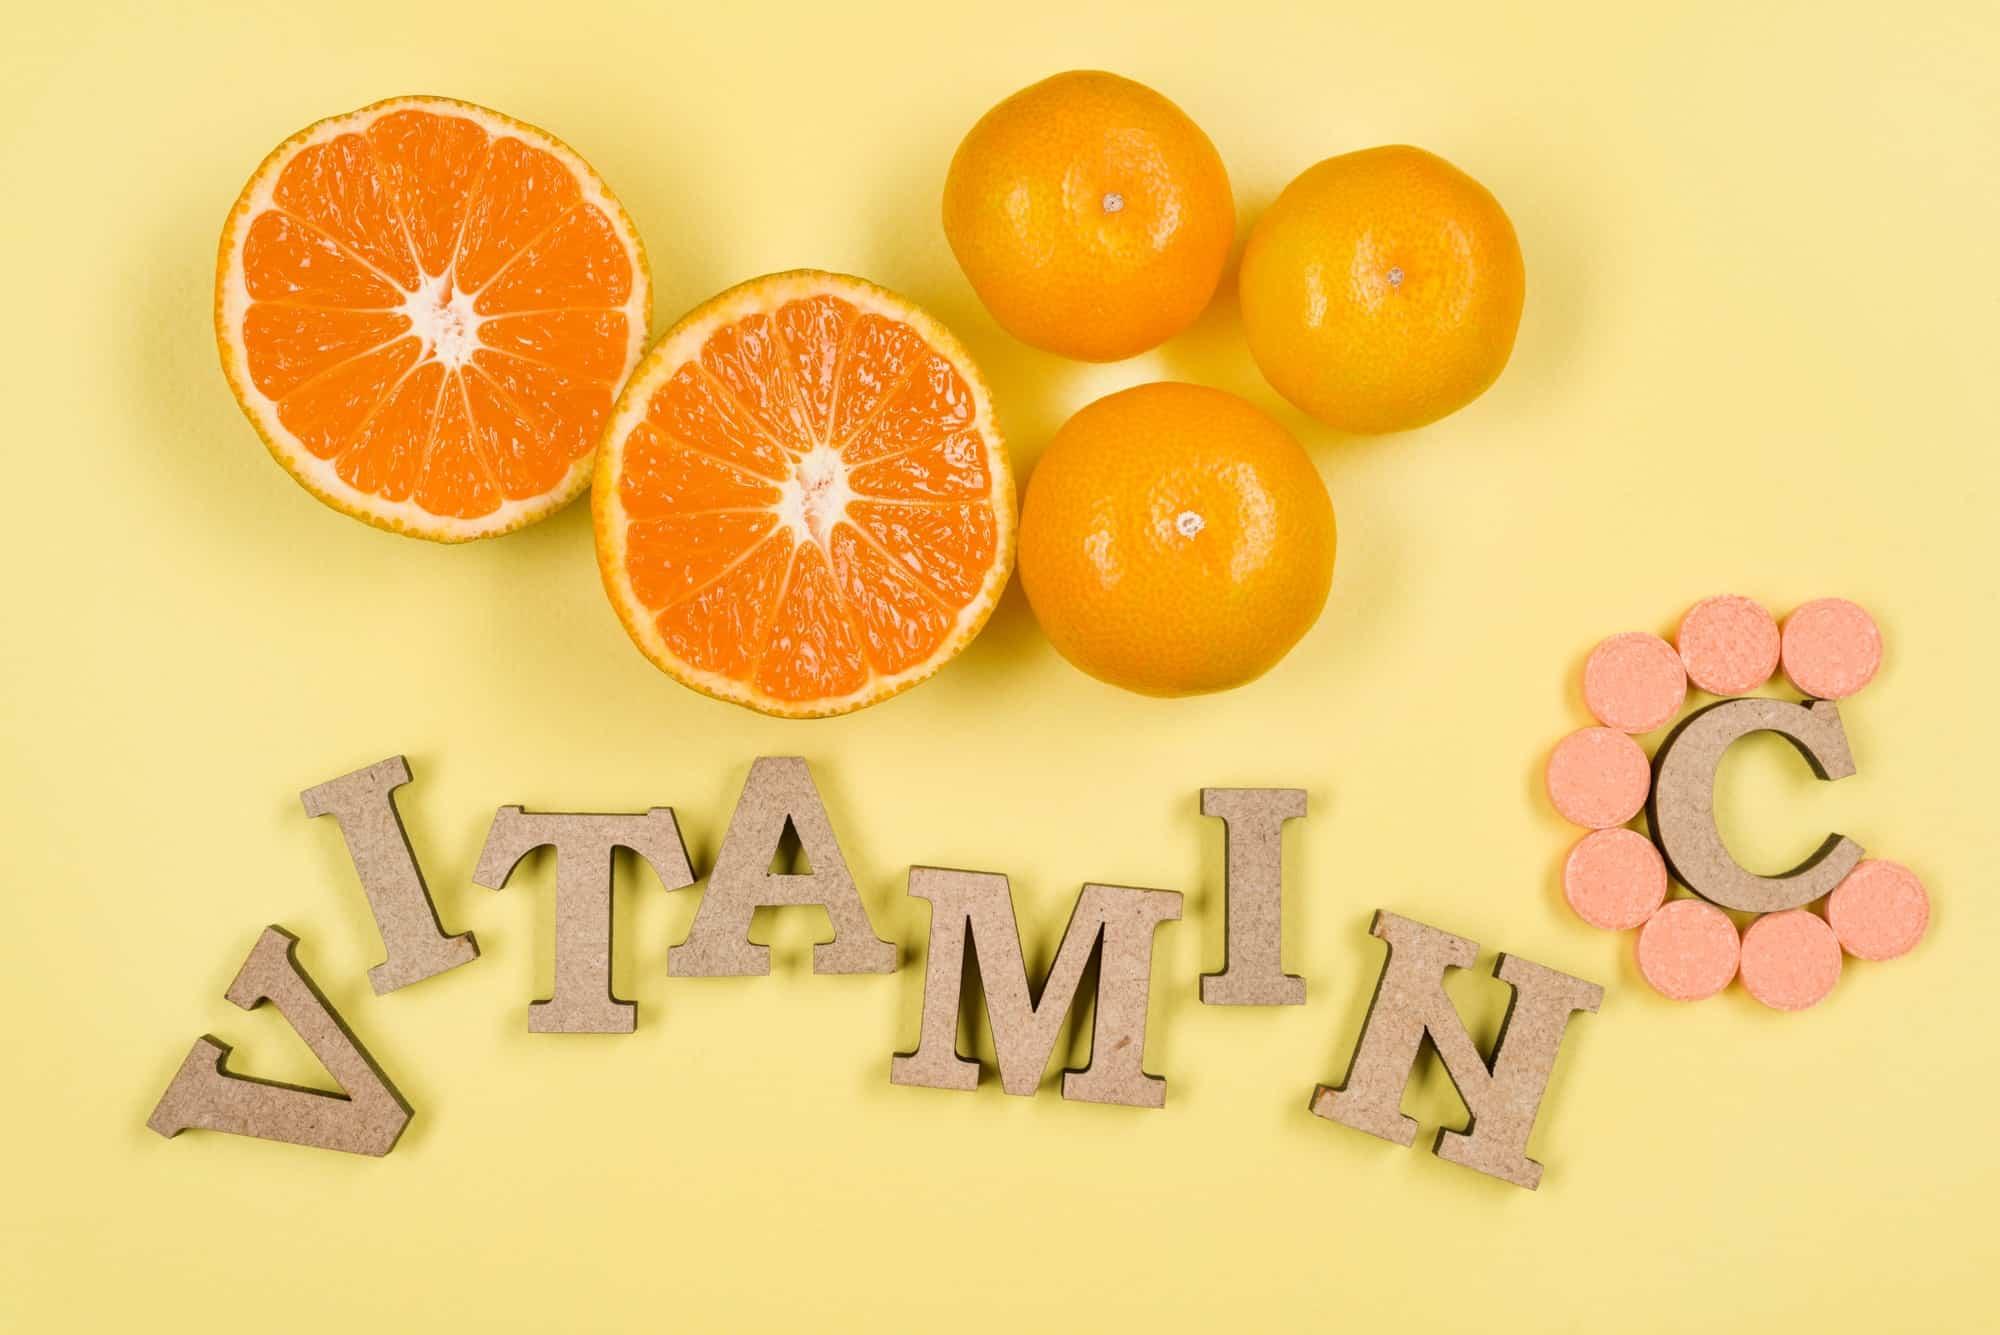 Word vitamin C is written in wooden letters